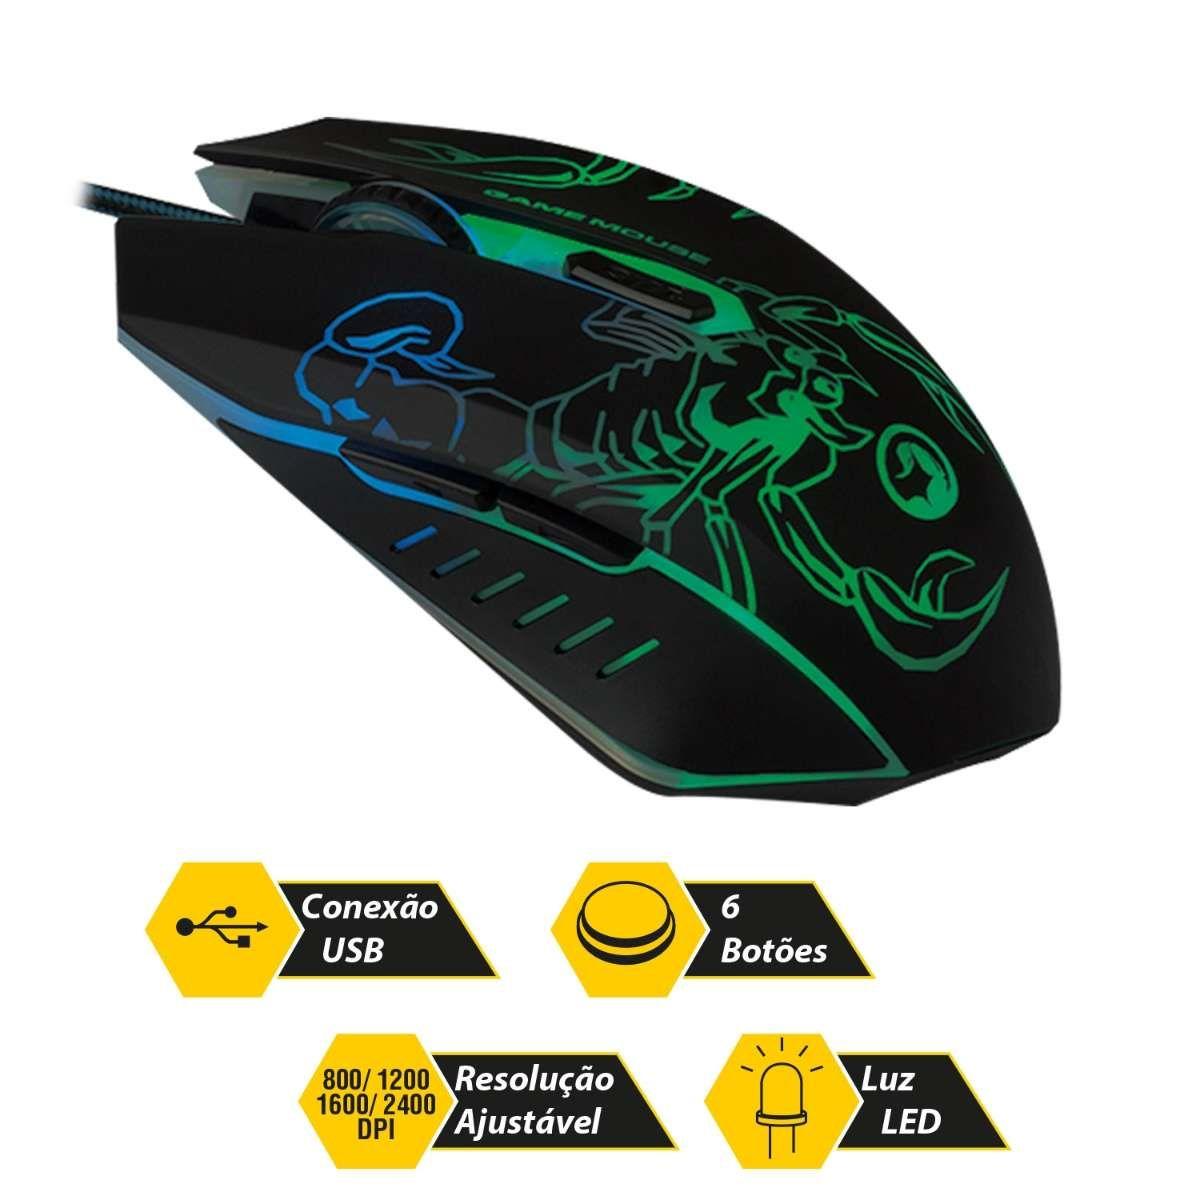 Mouse Gamer Óptico Light USB 2400 Dpi 0447 Bright